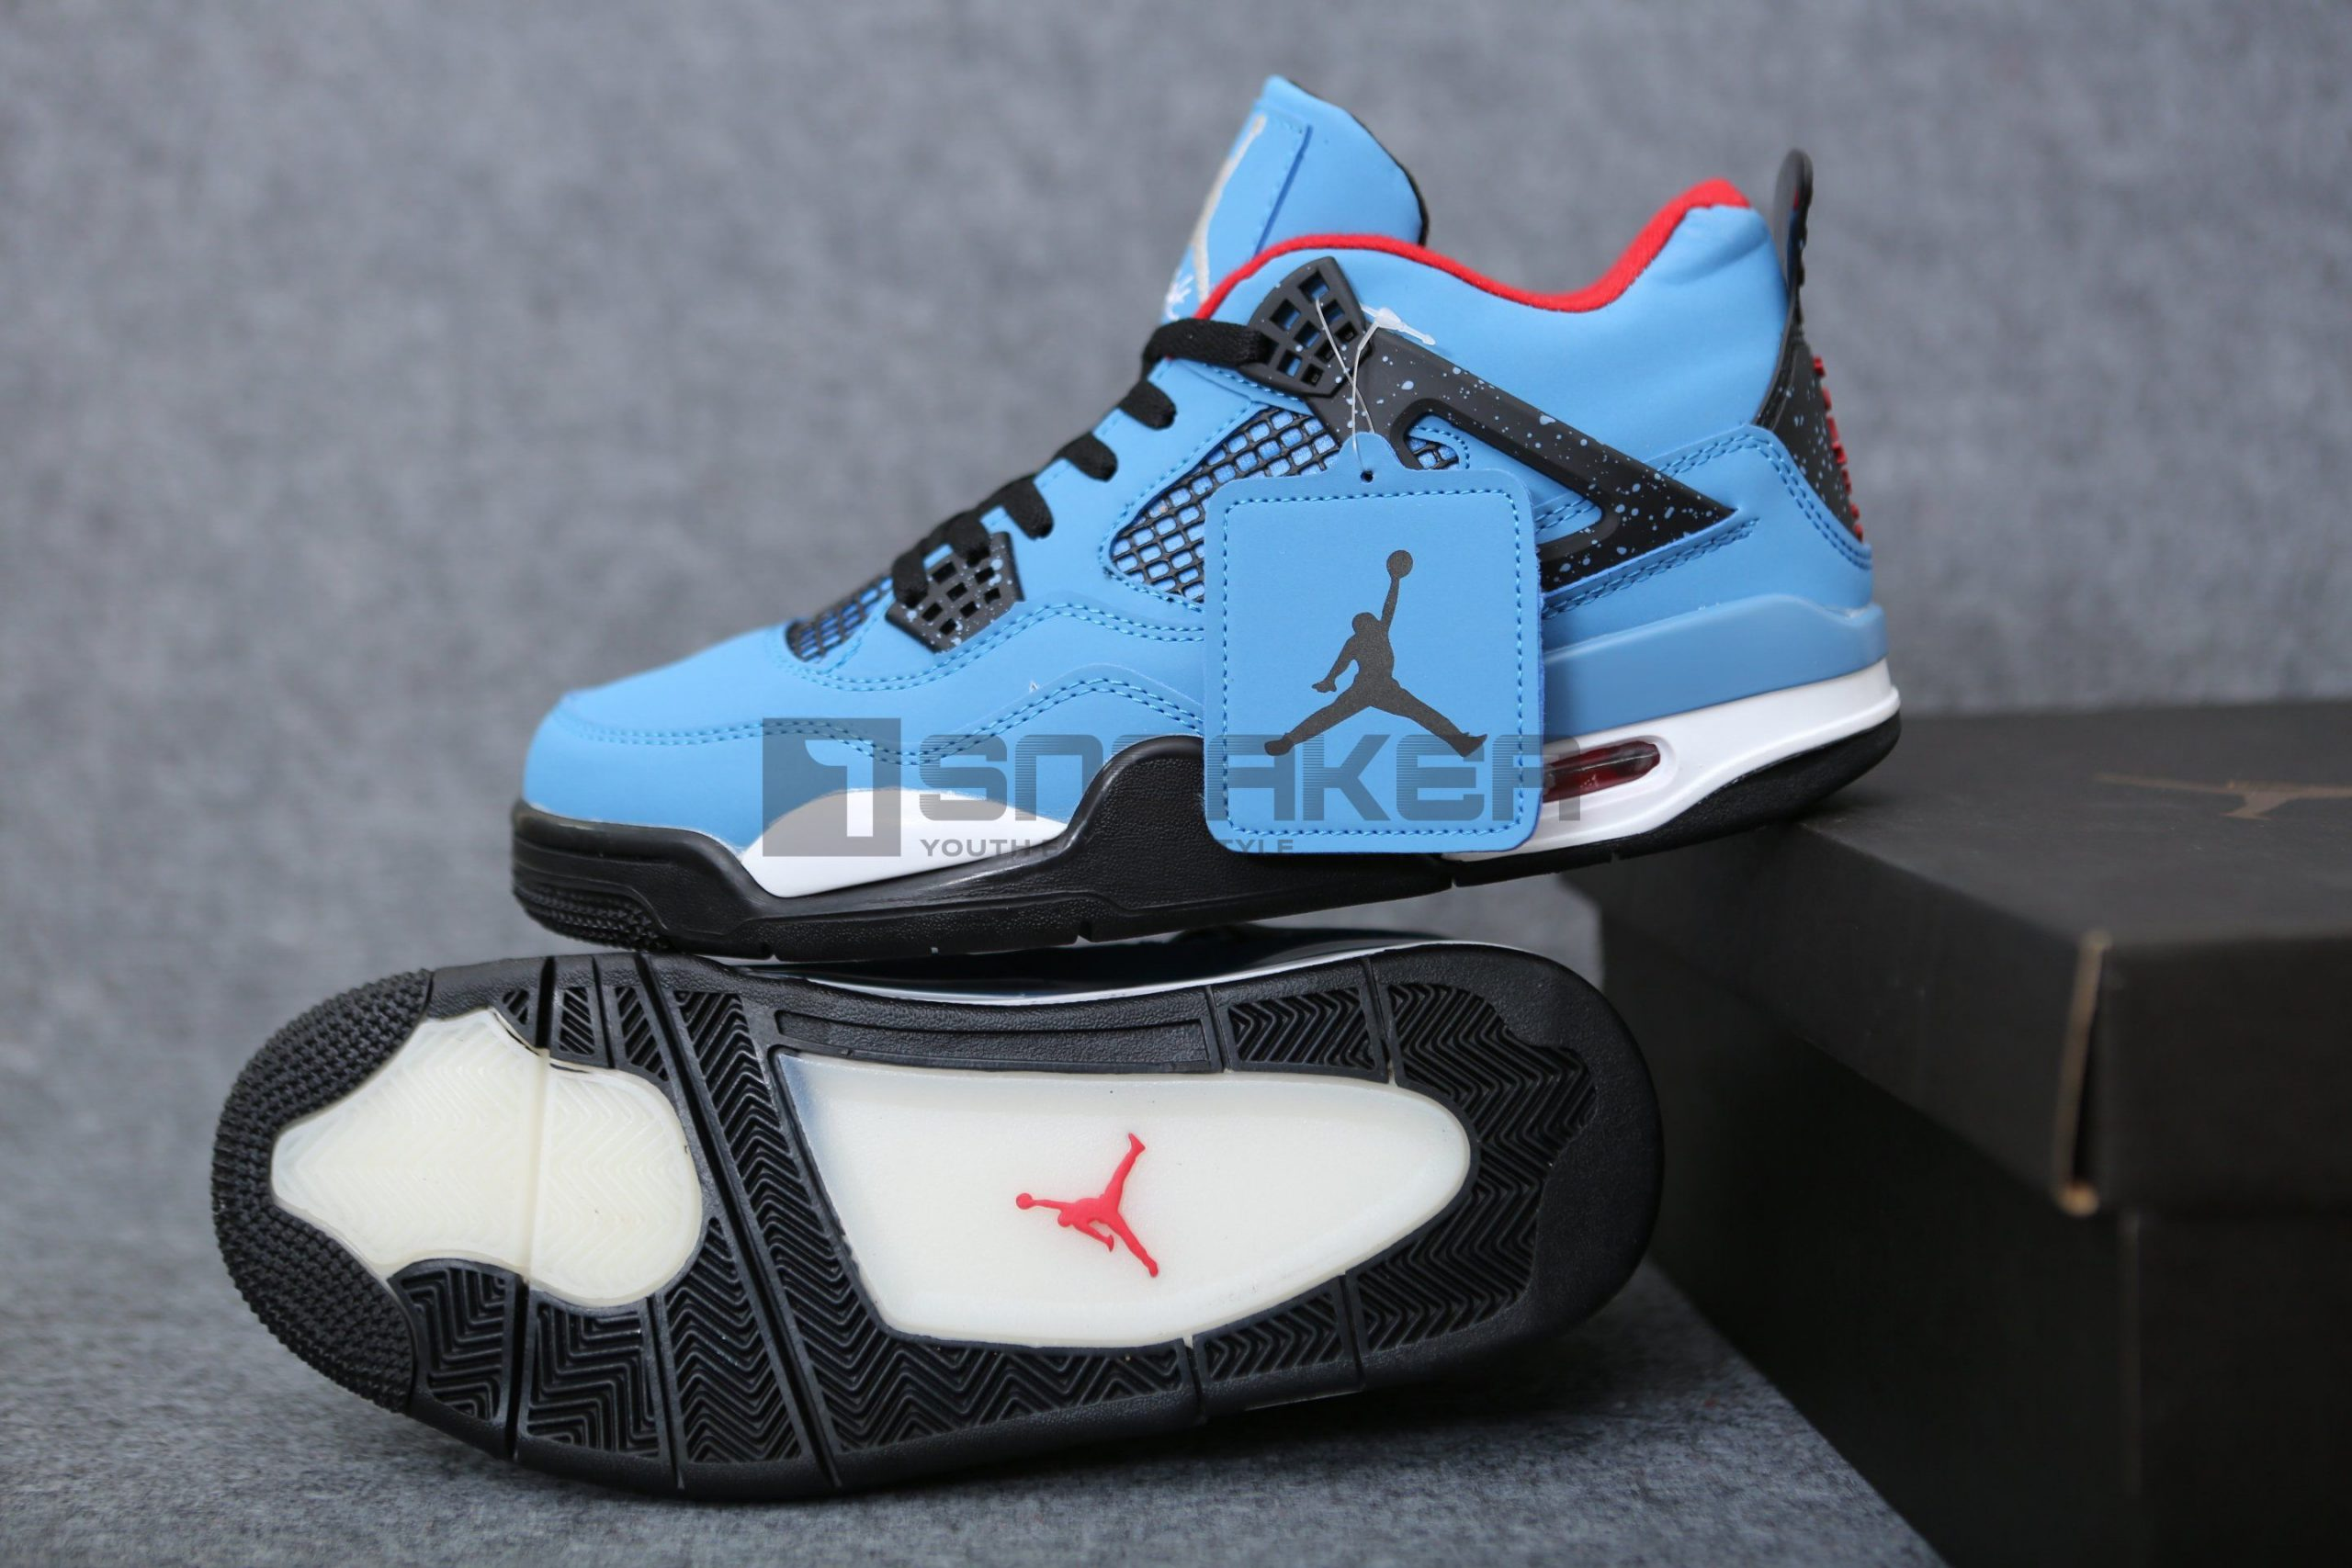 Giay Nike Air Jordan 4 Travis Scott Pk God Factory 5 scaled